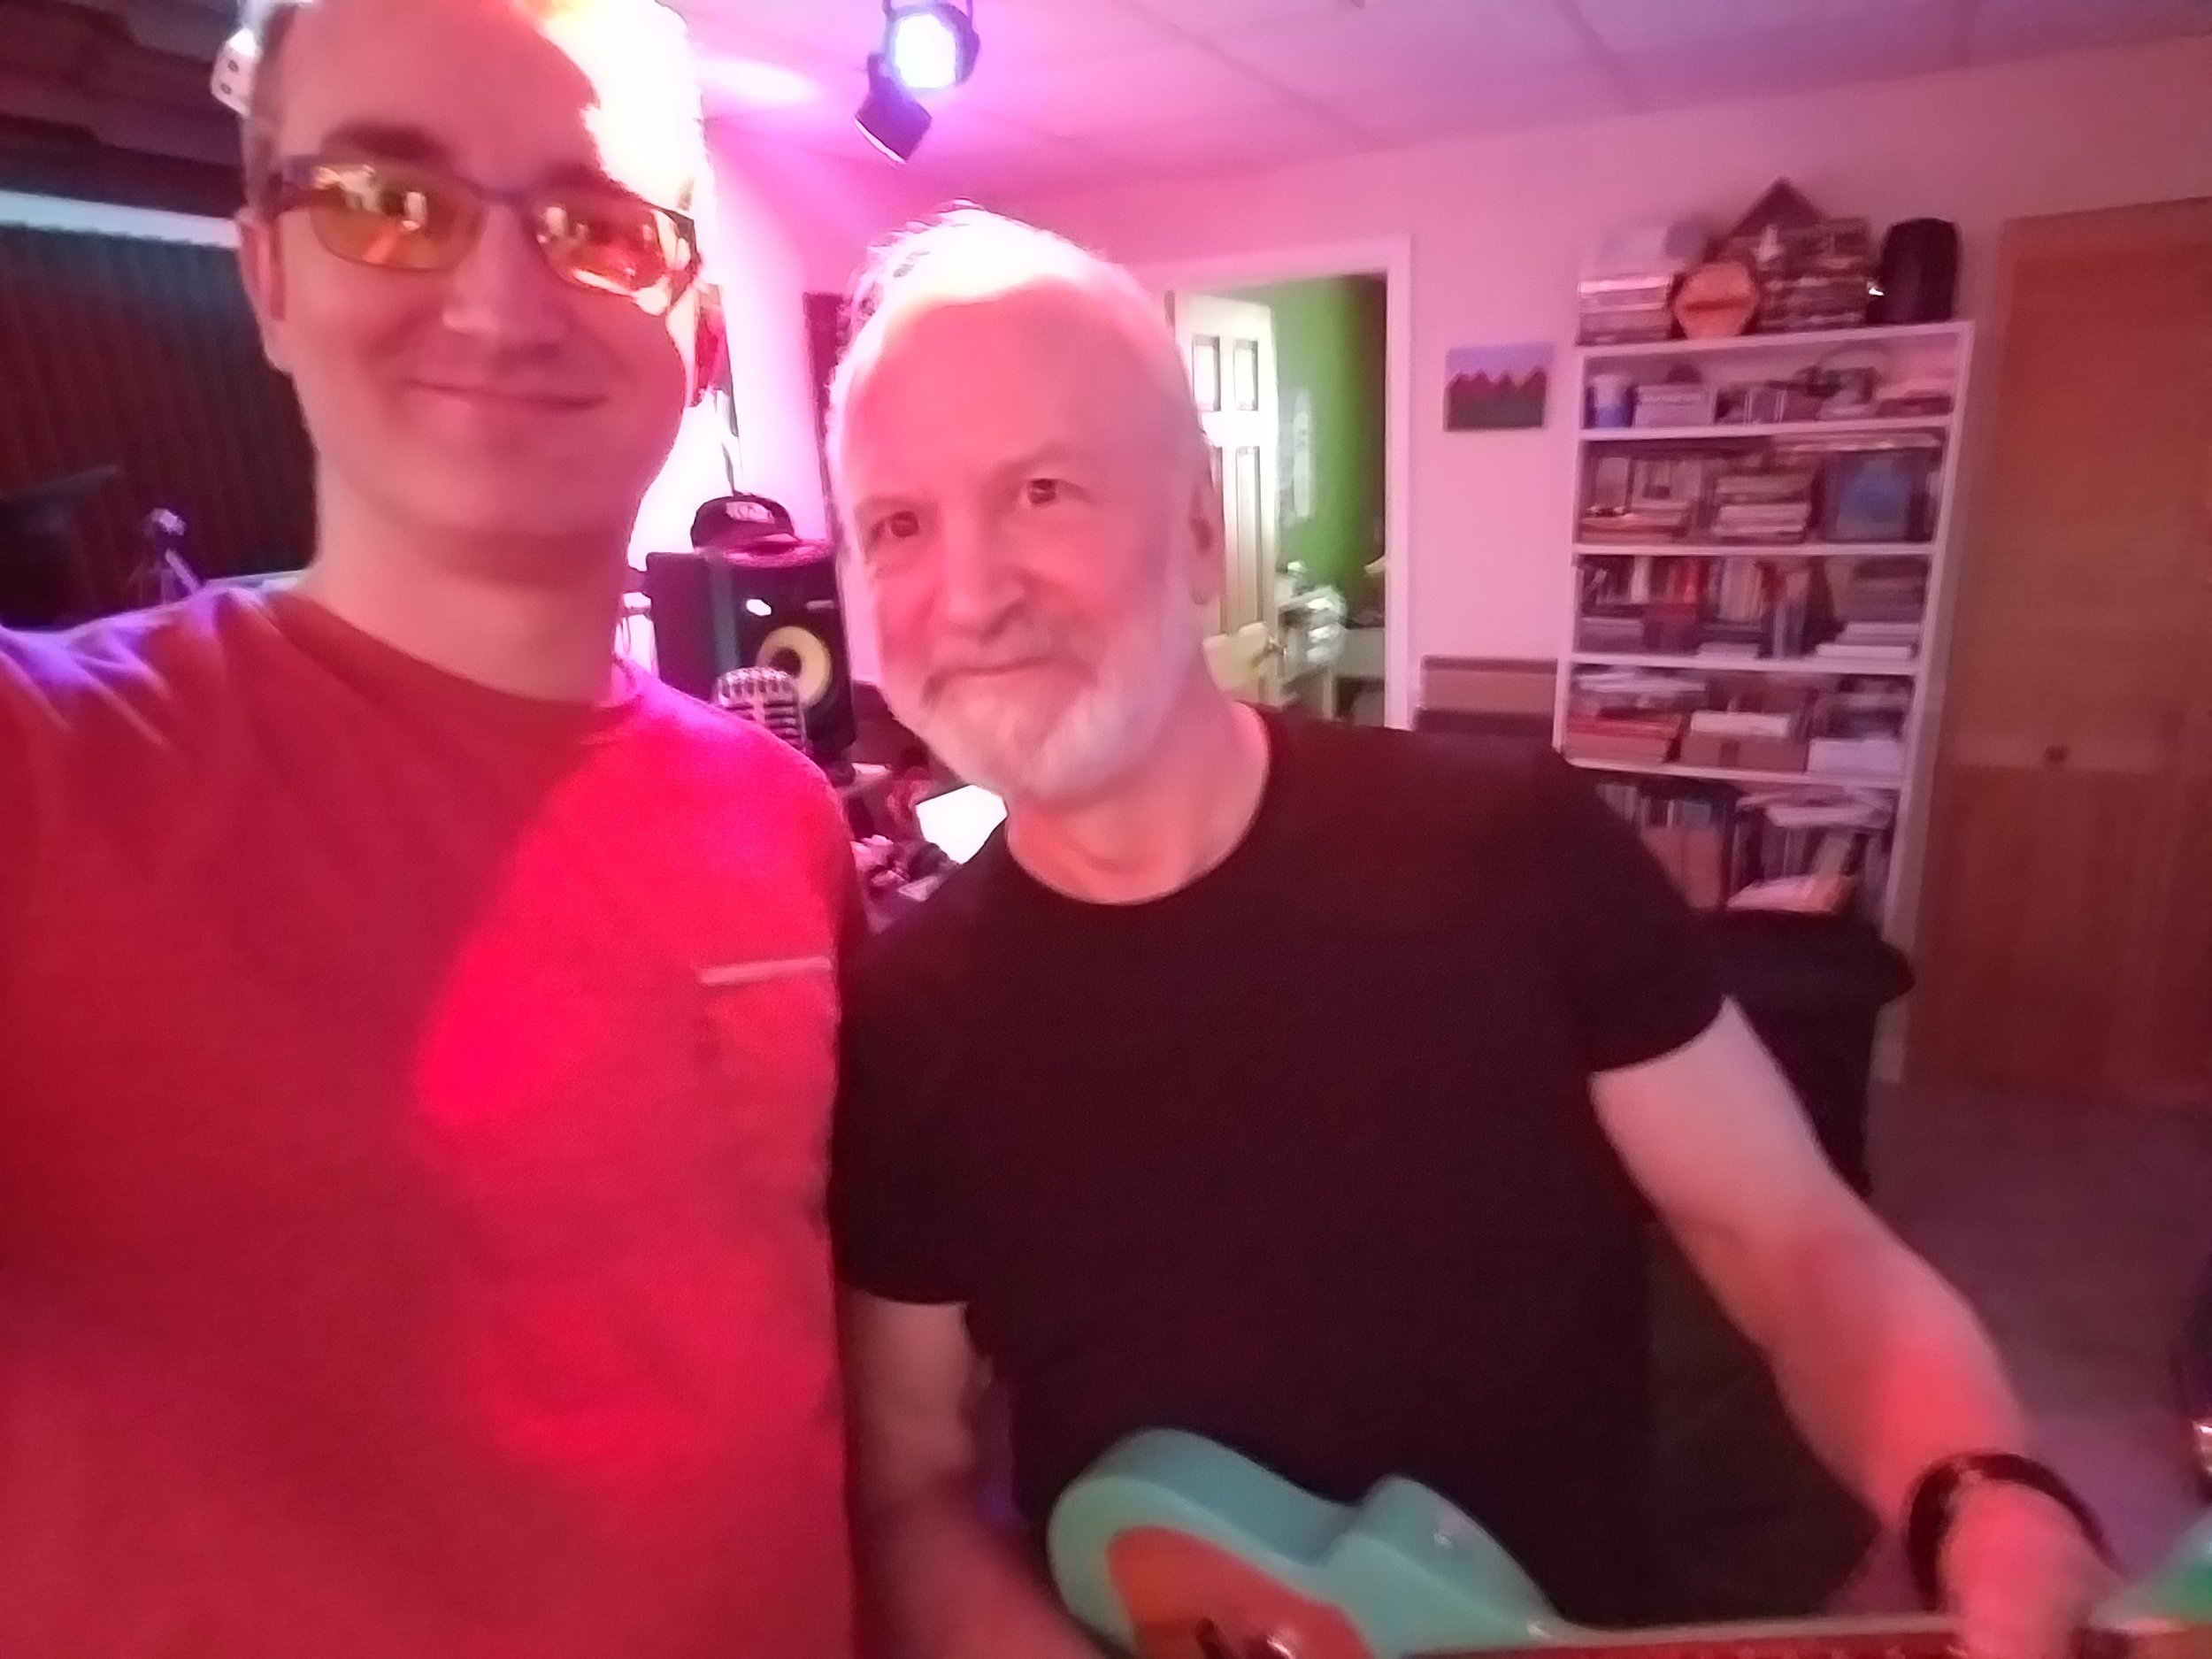 Episode 5:Wiehle-Reston - Steve Lasko, creator of Janglebox